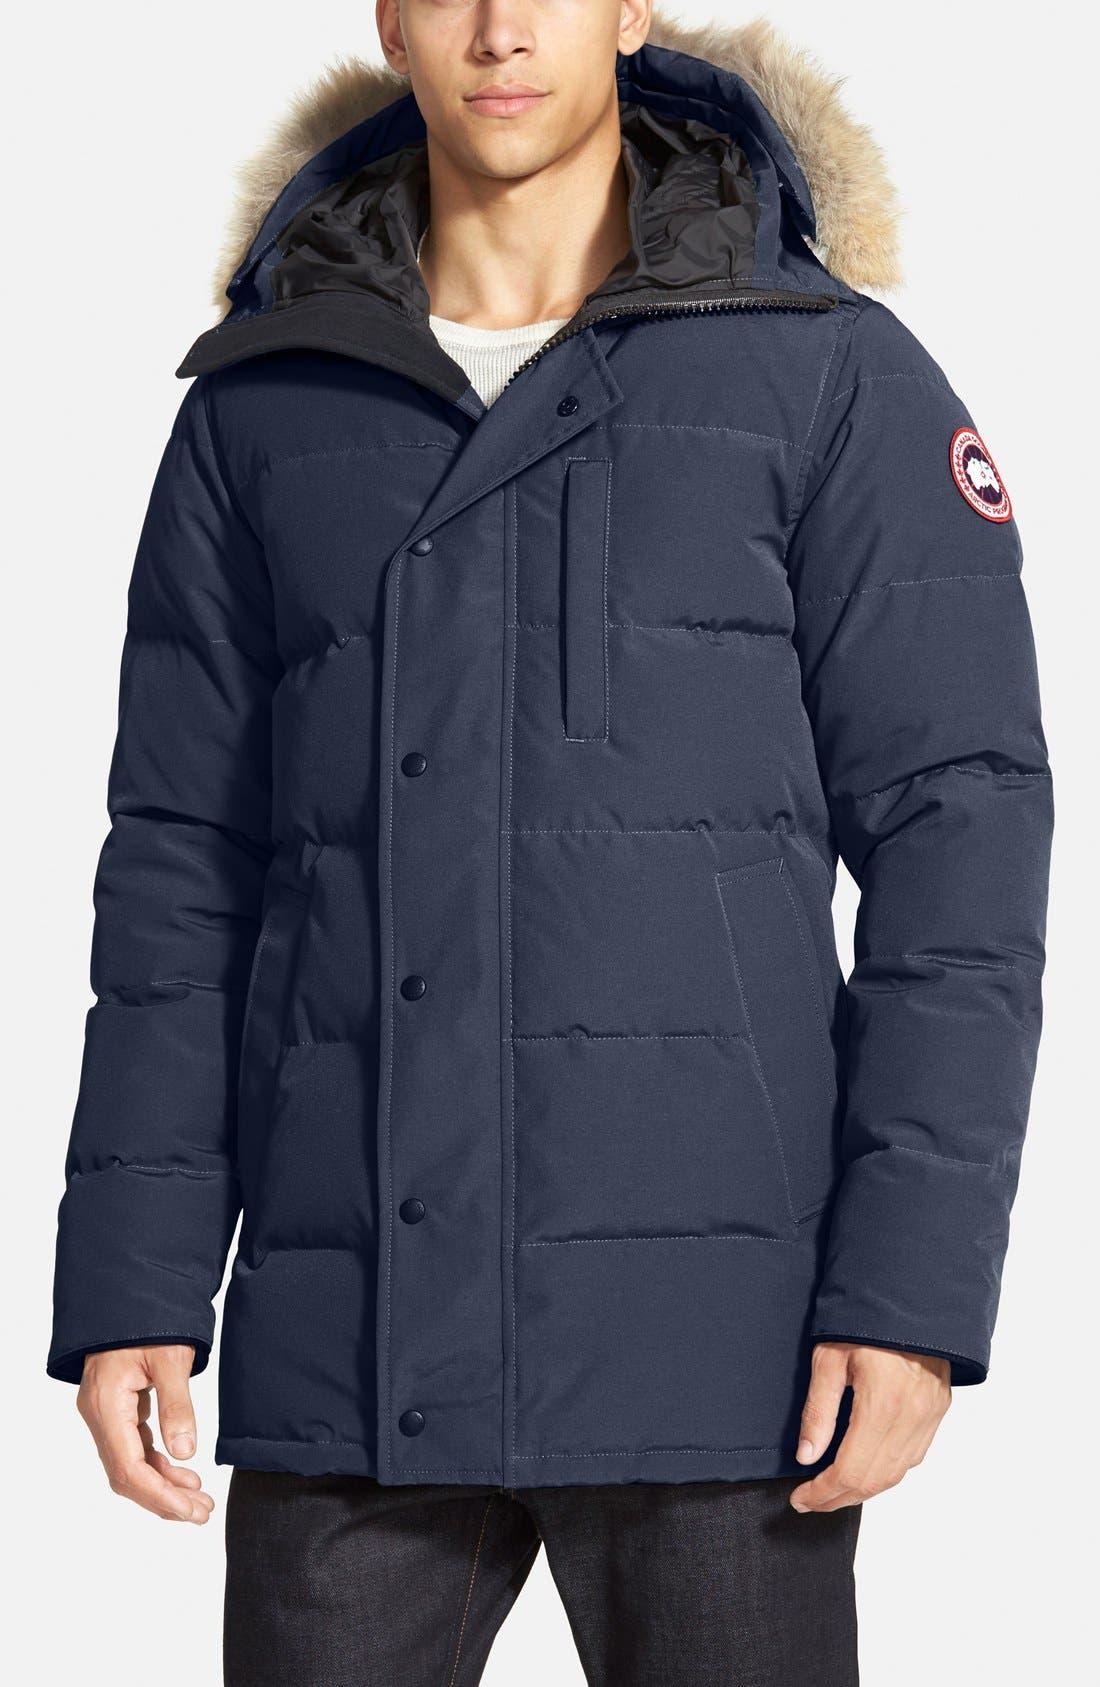 Men's Fur (Genuine) Coats & Men's Fur (Genuine) Jackets ...